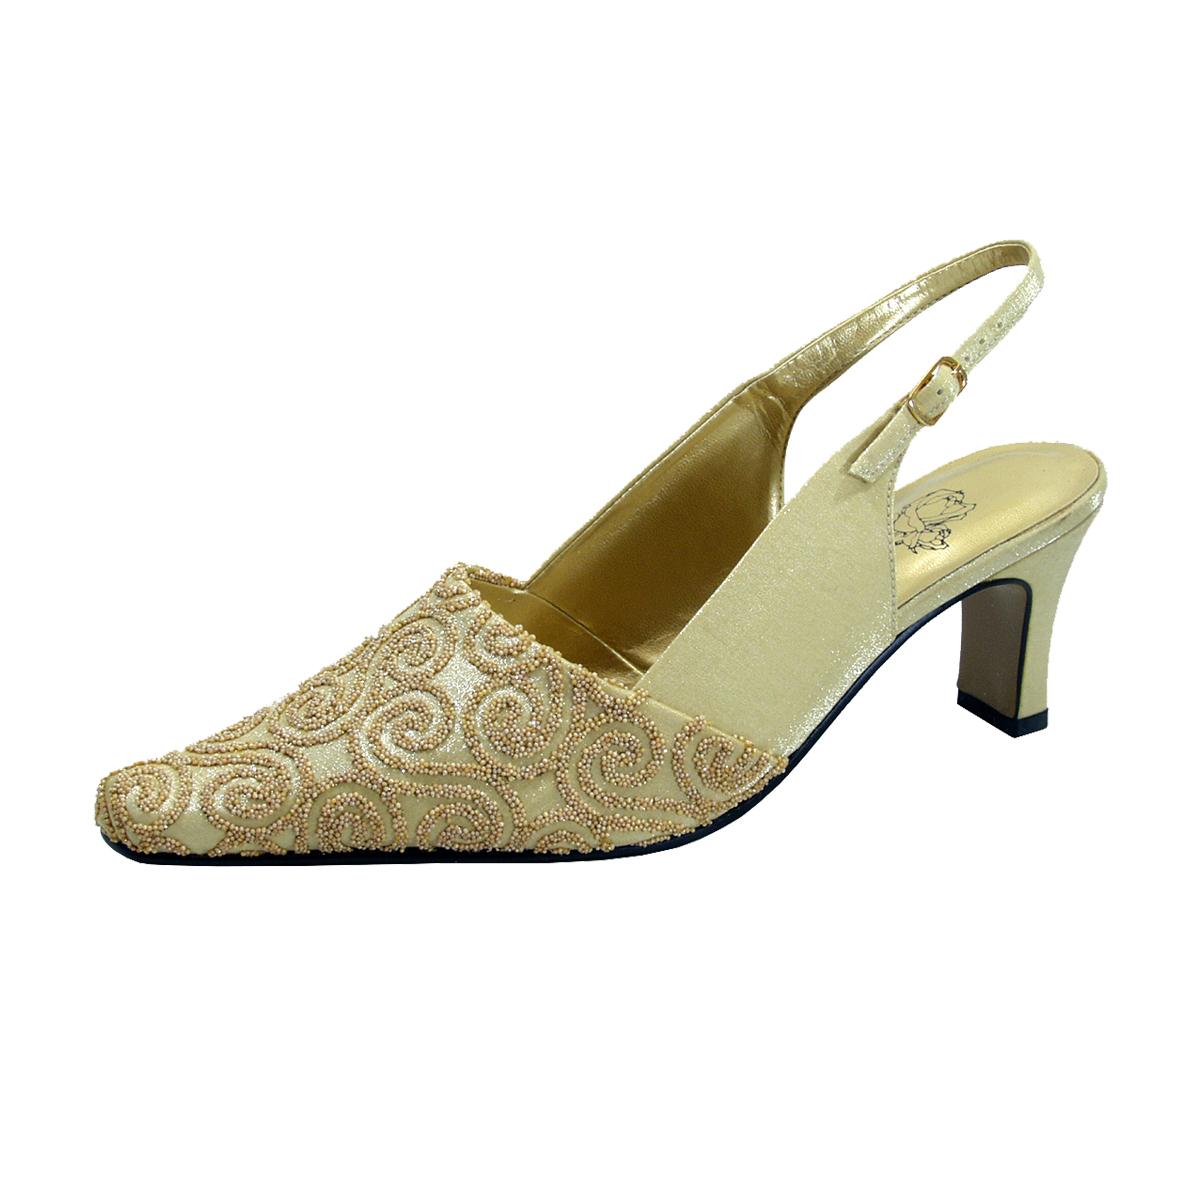 FLORAL Clover Women's Wide Width Dress Slingback Shoes - $29.95